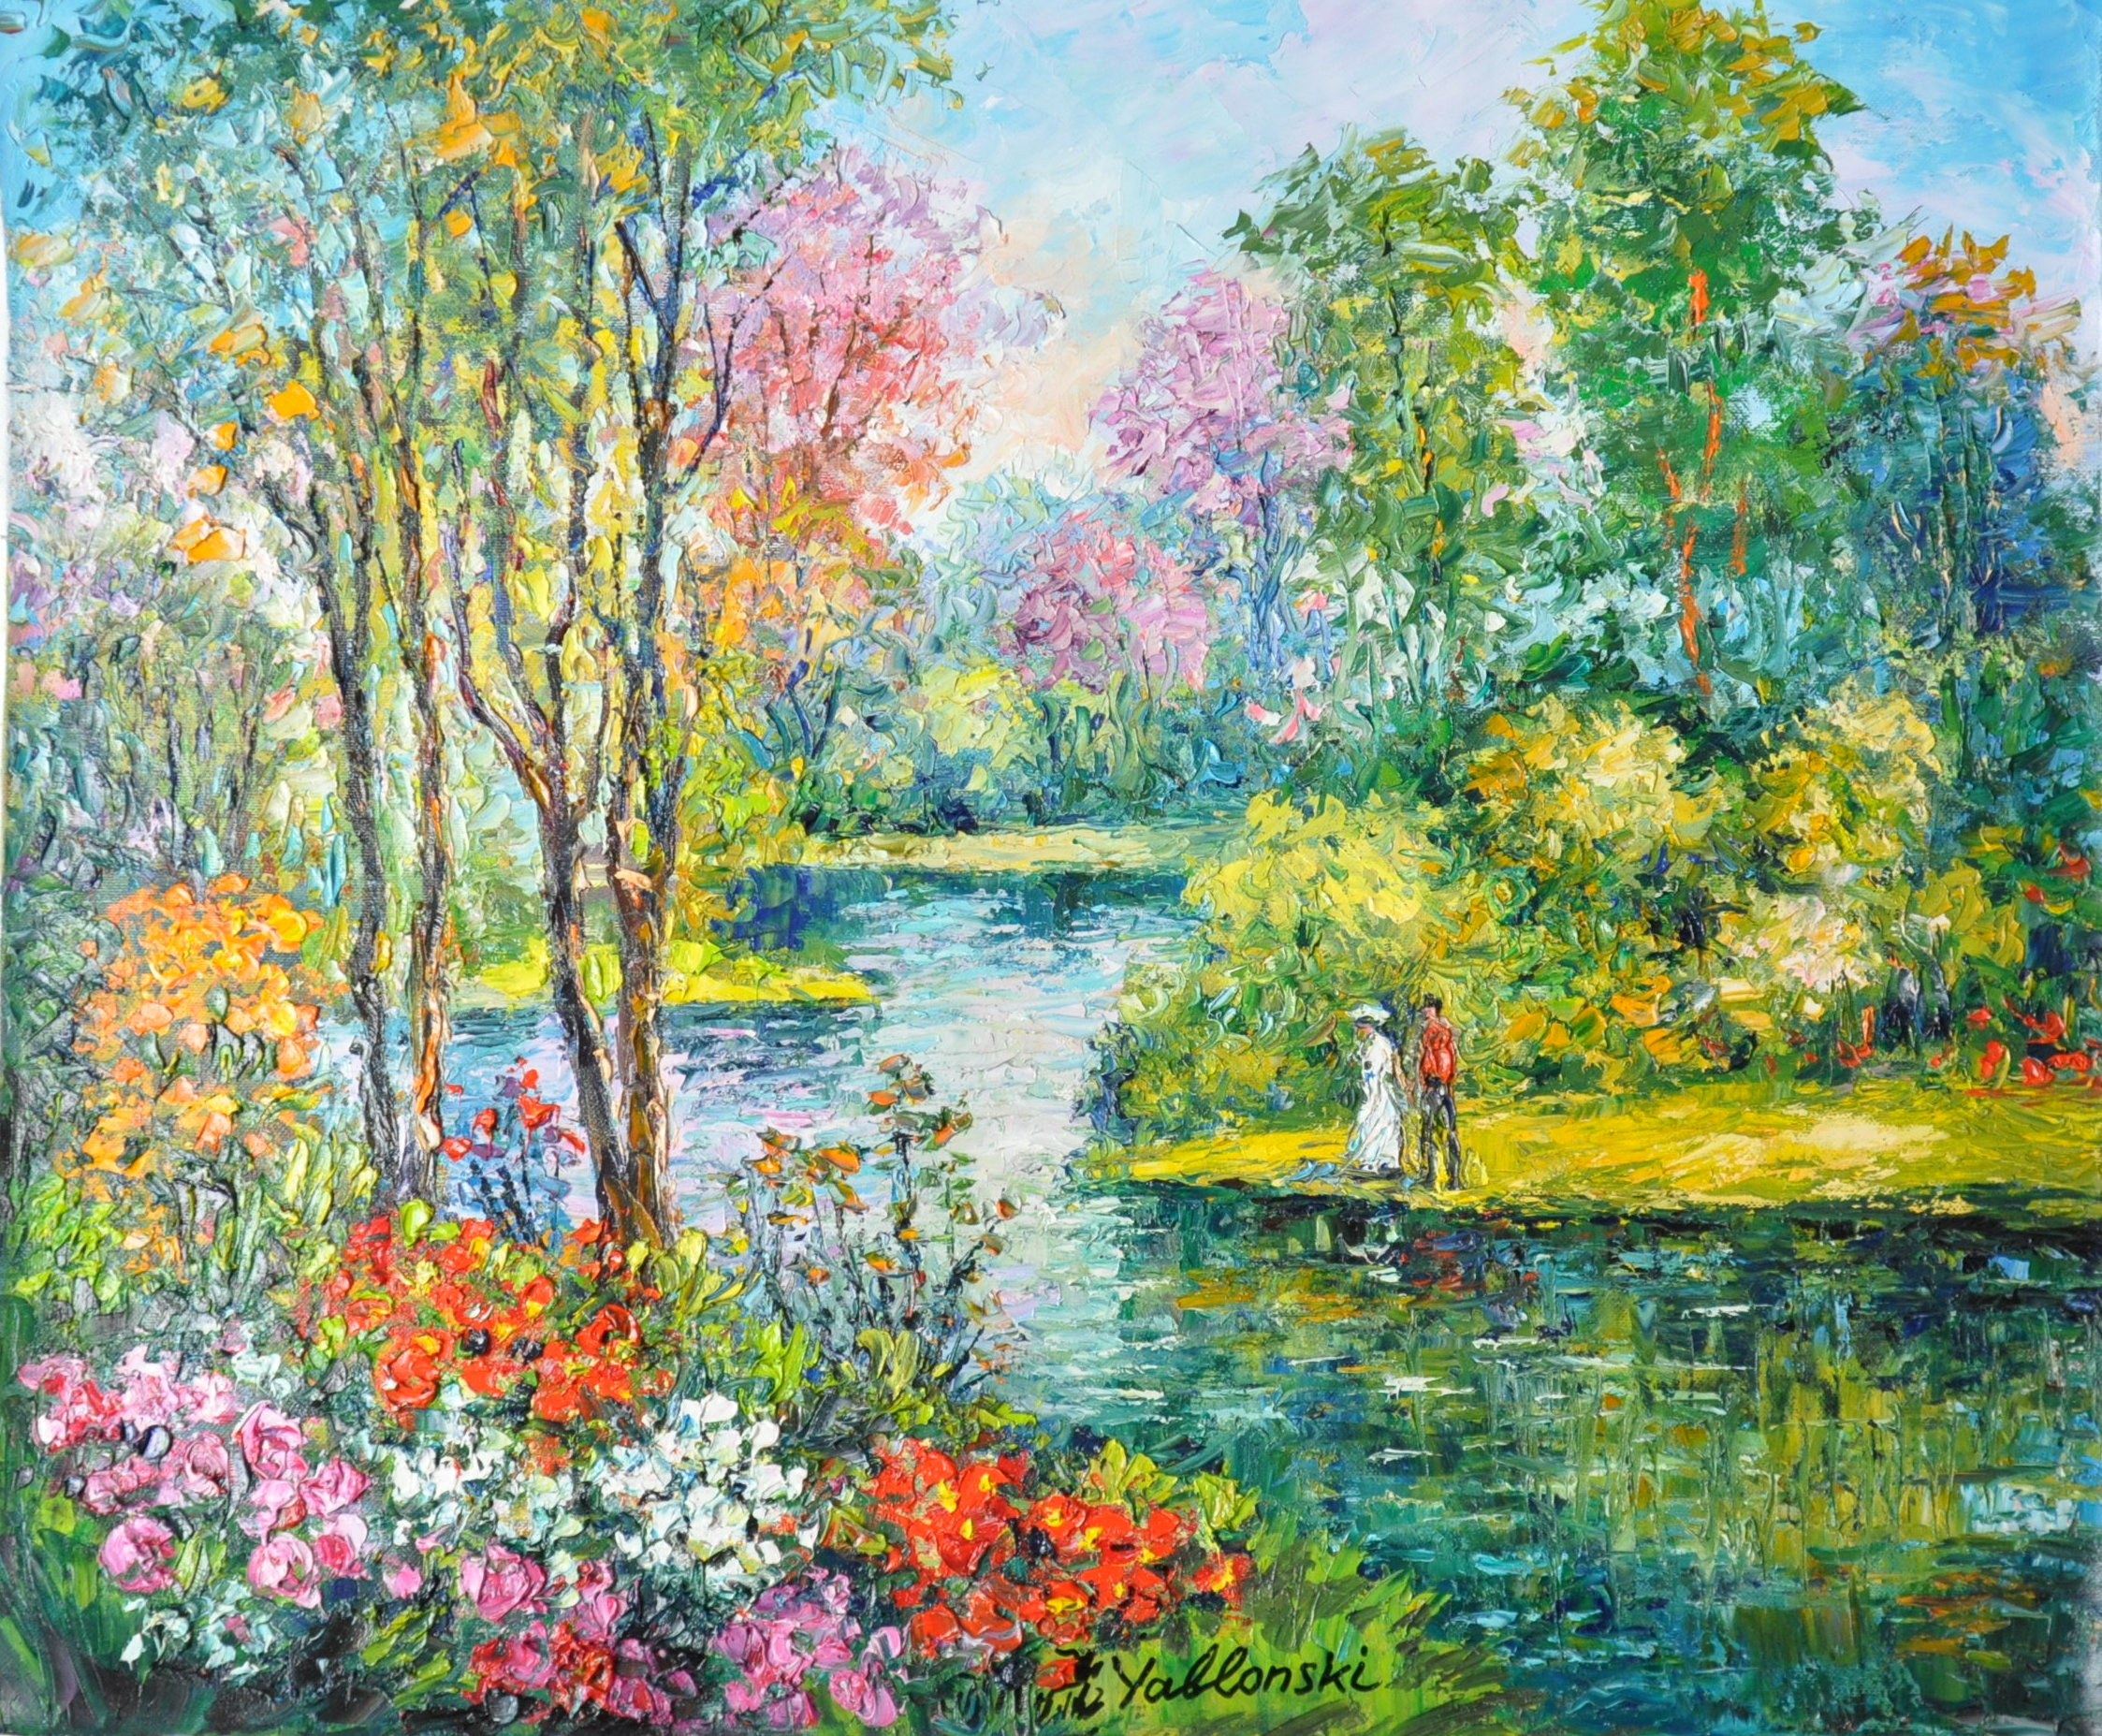 Shafira Yablonski's art